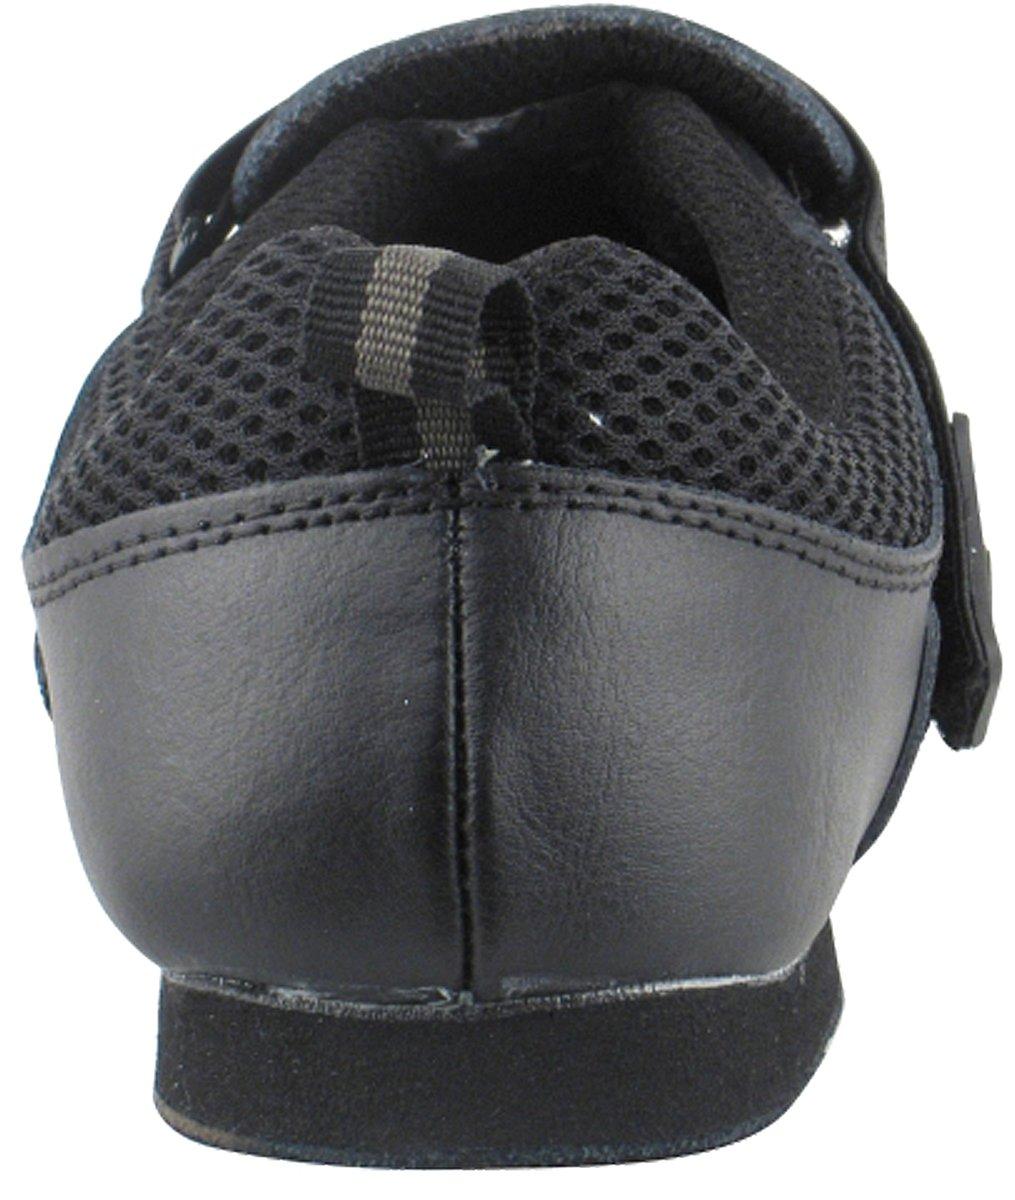 Very Fine Men's Women's Salsa Ballroom Latin Zumba Hip Hop Dance Sneakers Style VFSN009 Bundle with Dance Shoe Wire Brush, Black 12 M US (US Women 12/ US Men 10.5) by Very Fine Dance Shoes (Image #4)